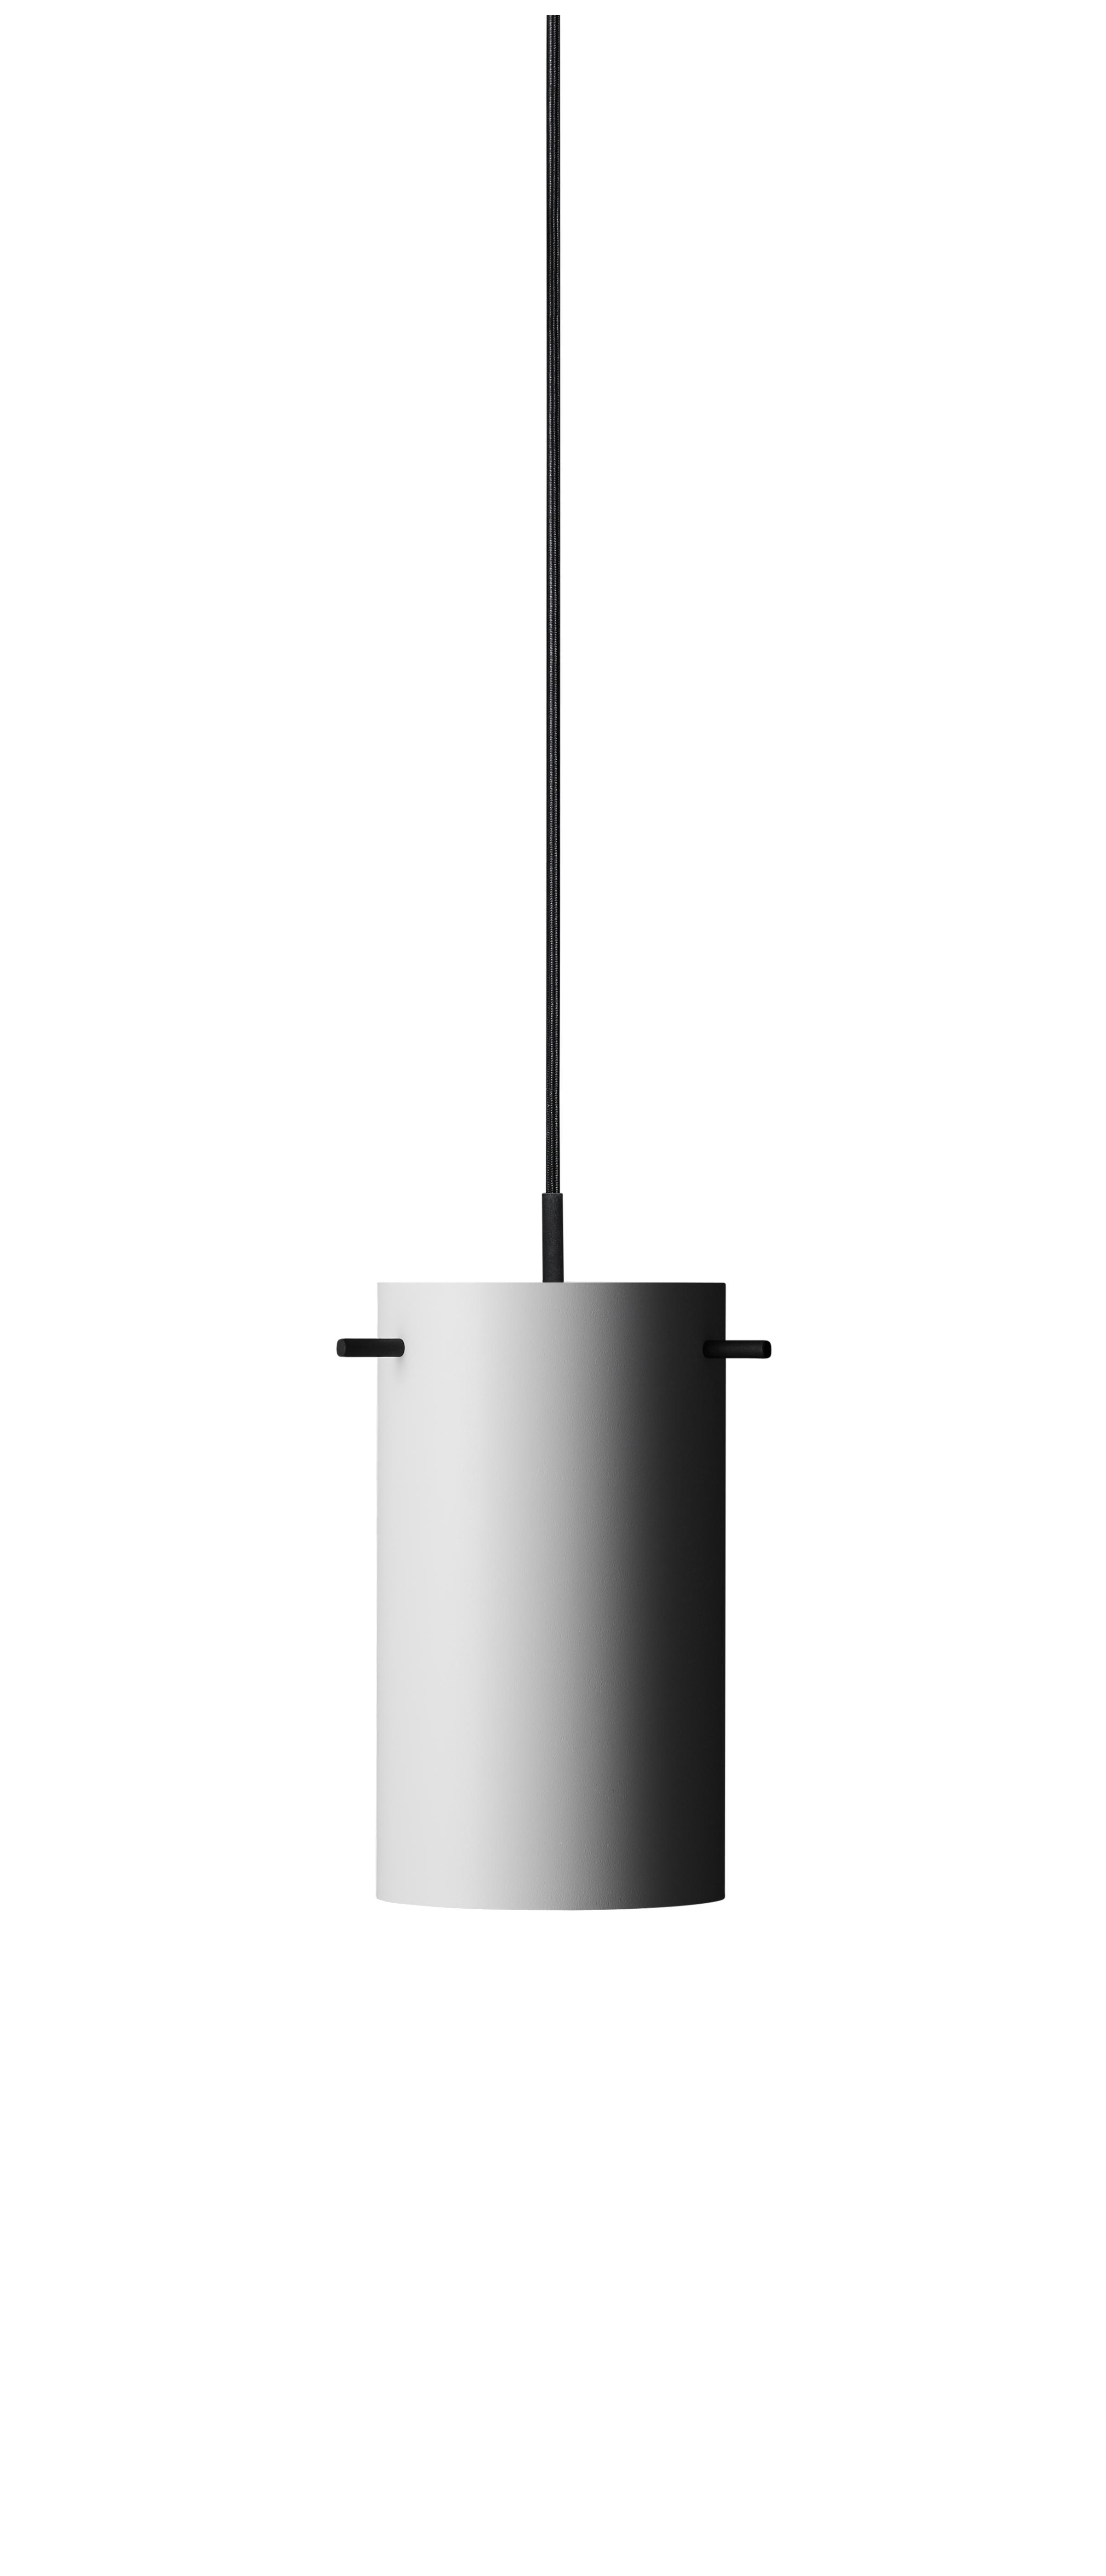 Lustra FM 1954 O16 cm White